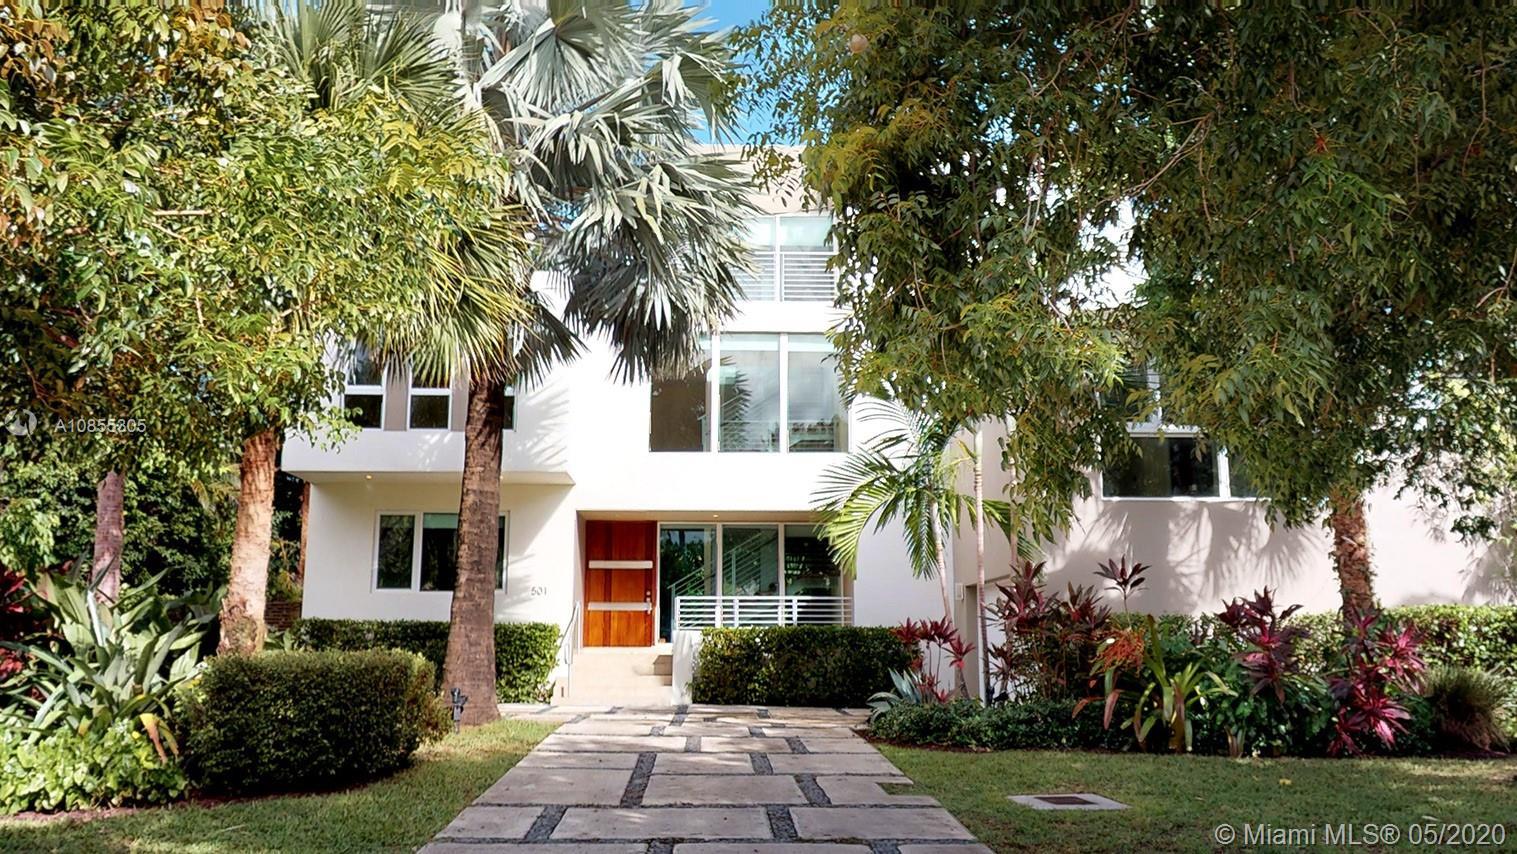 Tropical Isle Homes - 501 Harbor Dr, Key Biscayne, FL 33149